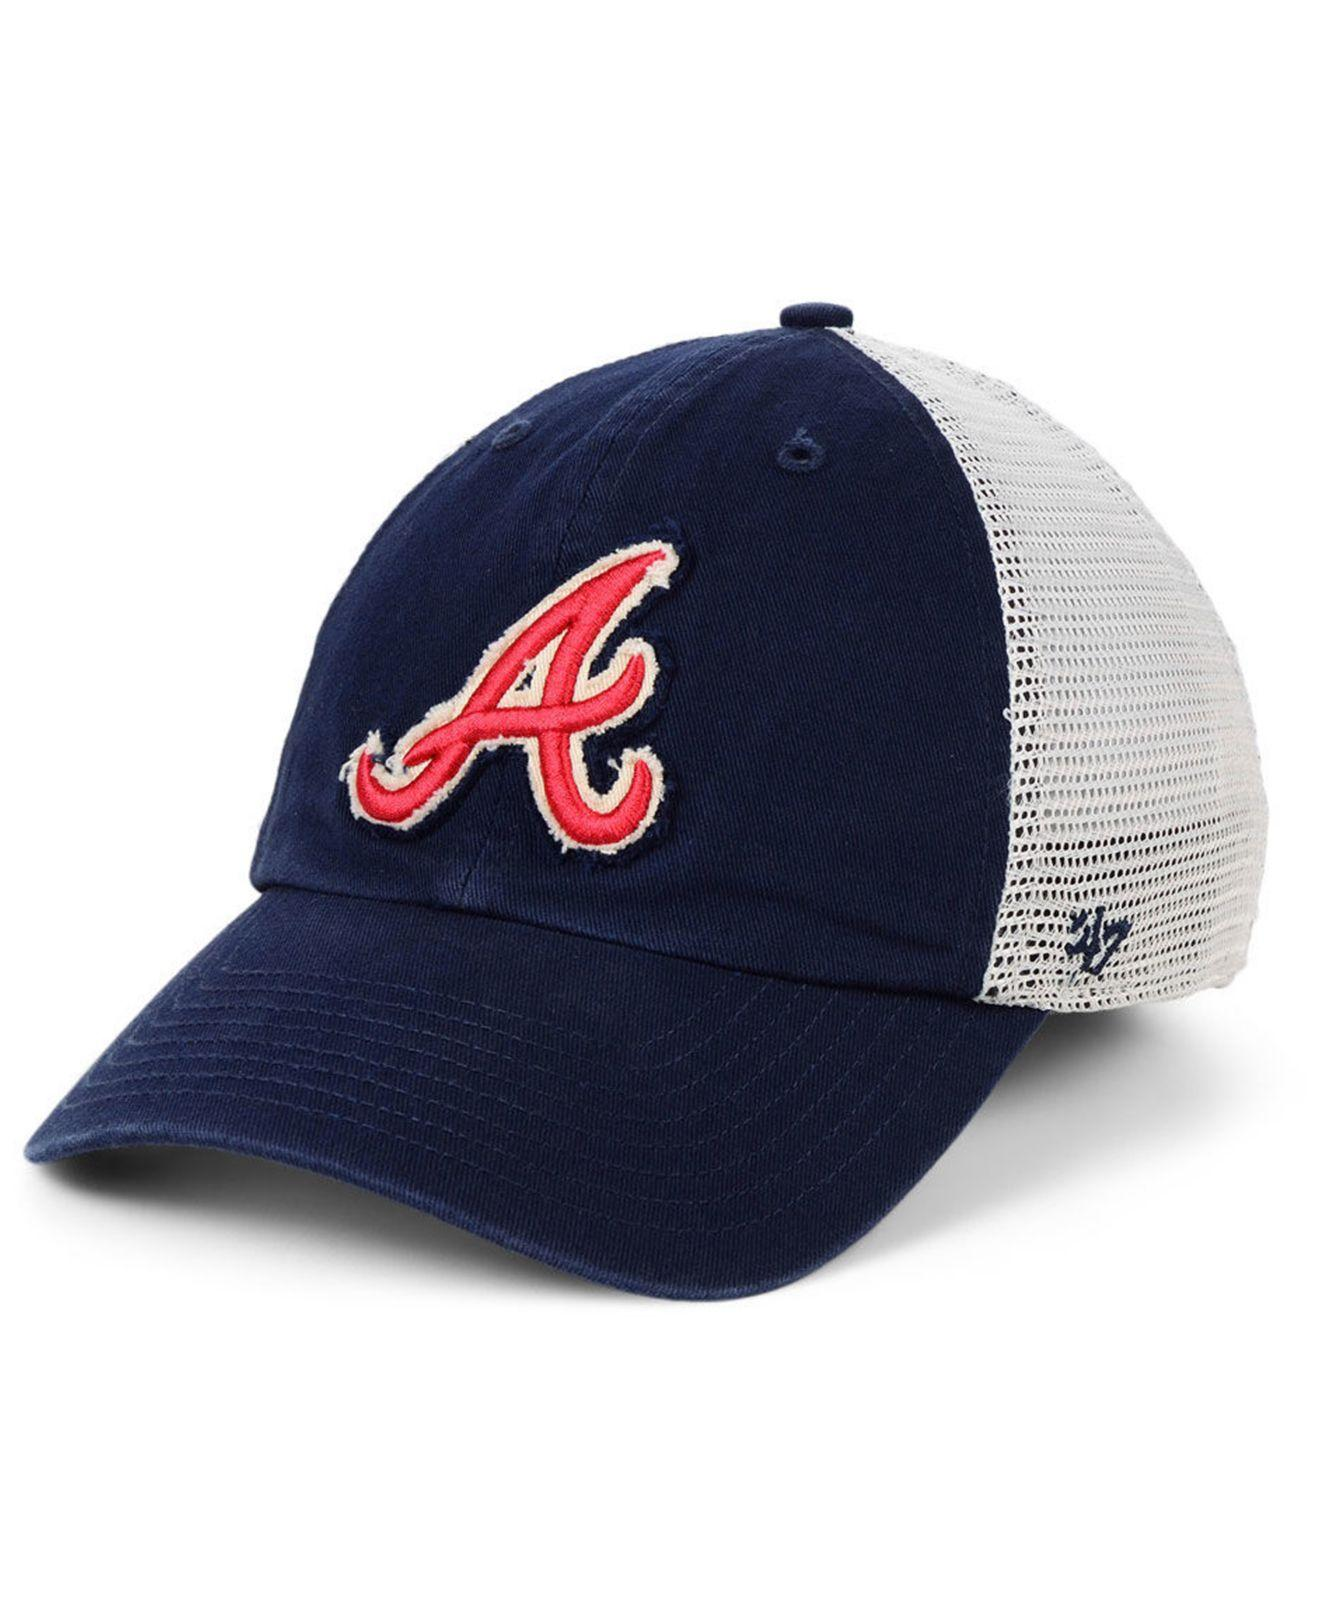 official photos 24afc 9f0a7 47 Brand. Men s Blue Atlanta Braves Stamper Mesh Closer Cap